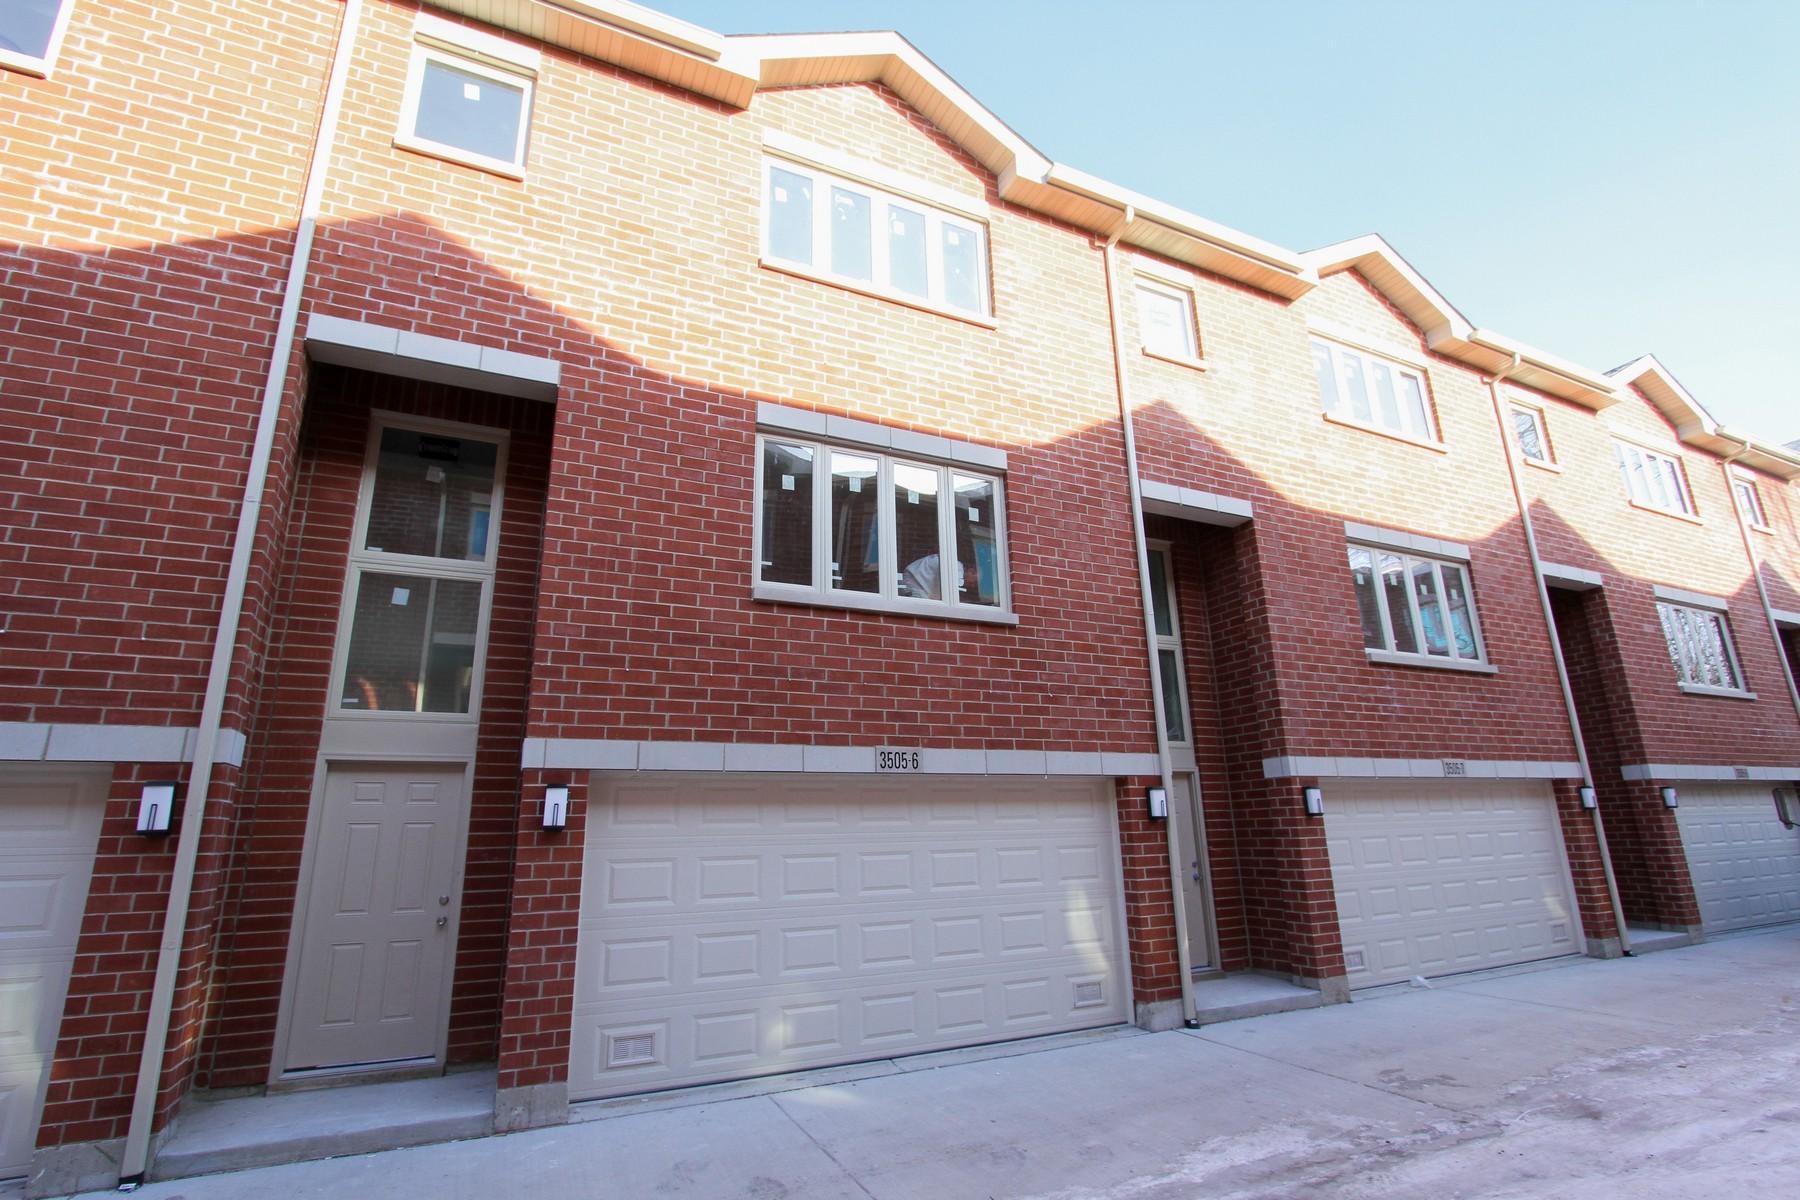 Residência urbana para Venda às McKinley Square Townhome! 3527 S Maplewood Avenue Unit 3 McKinley Park, Chicago, Illinois, 60632 Estados Unidos